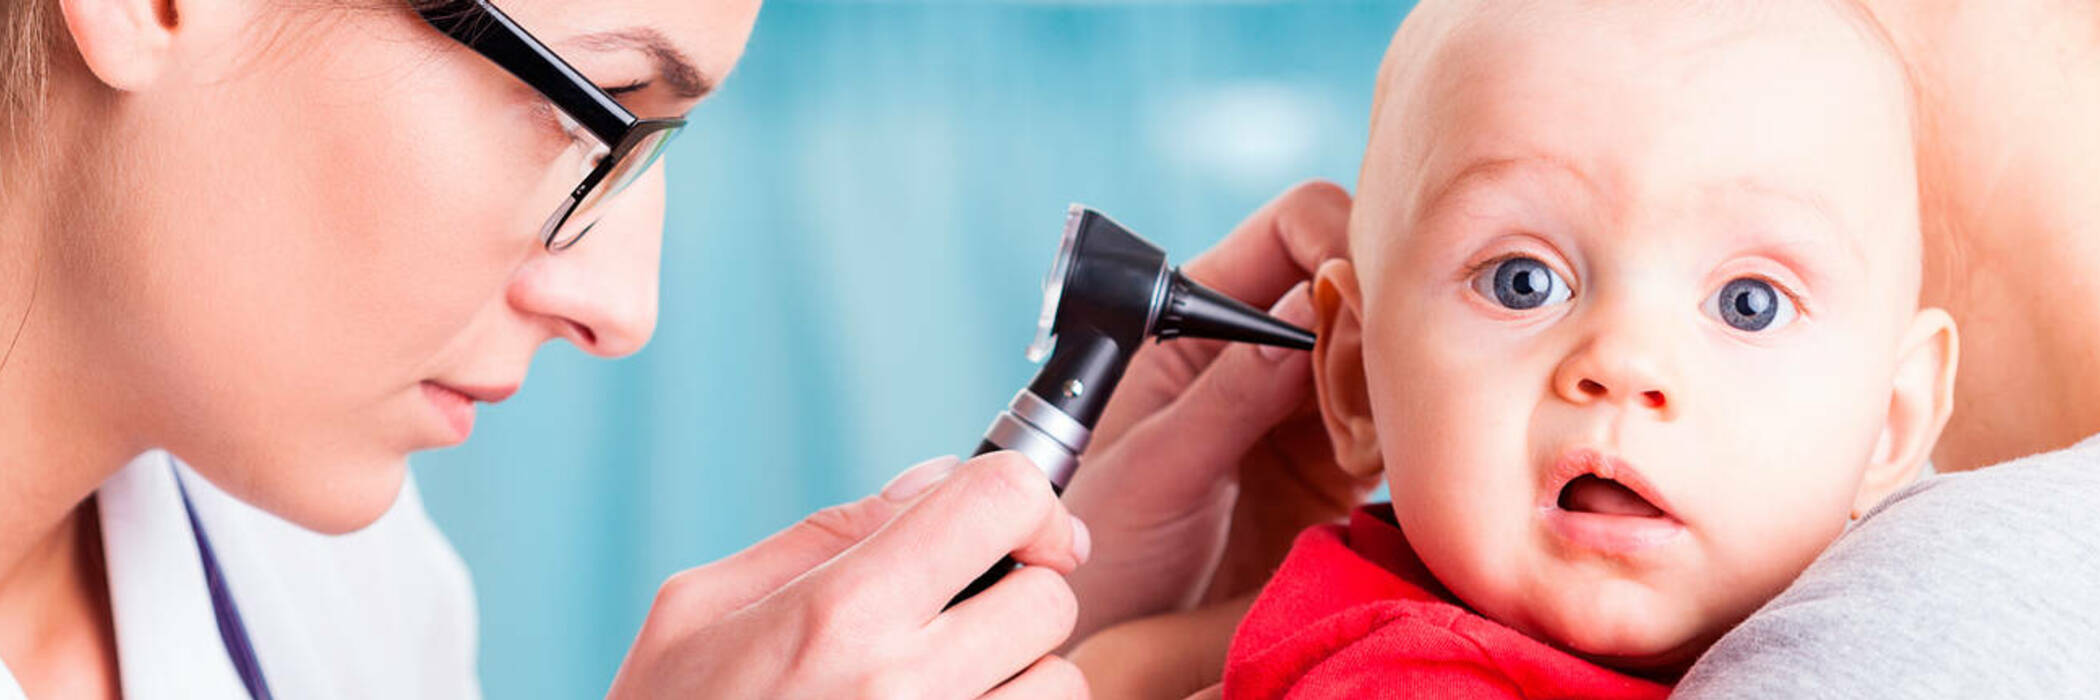 16nov ear infection hero